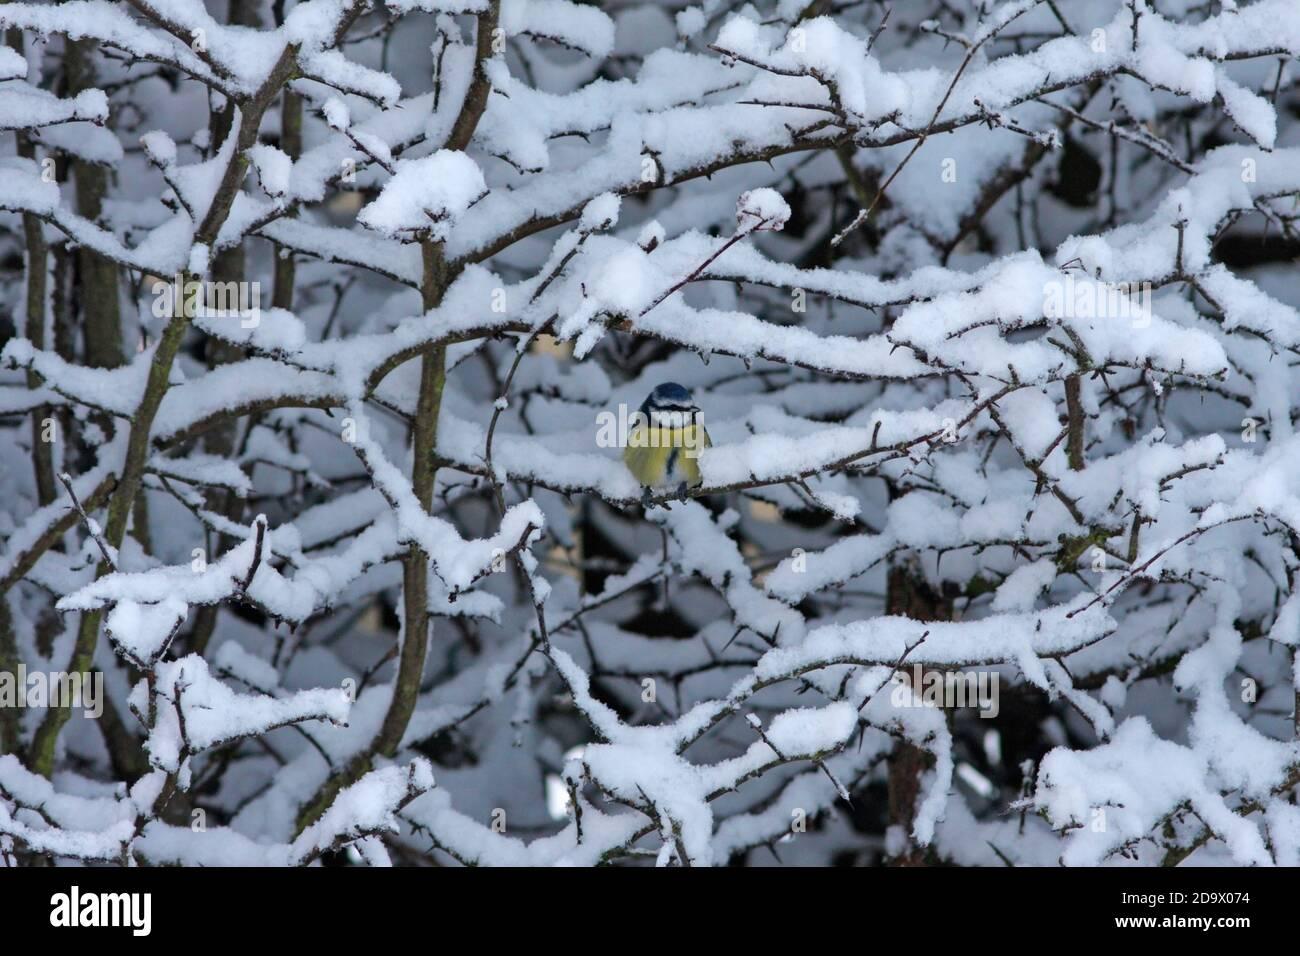 blue-tit-snow-uk-2D9X074.jpg